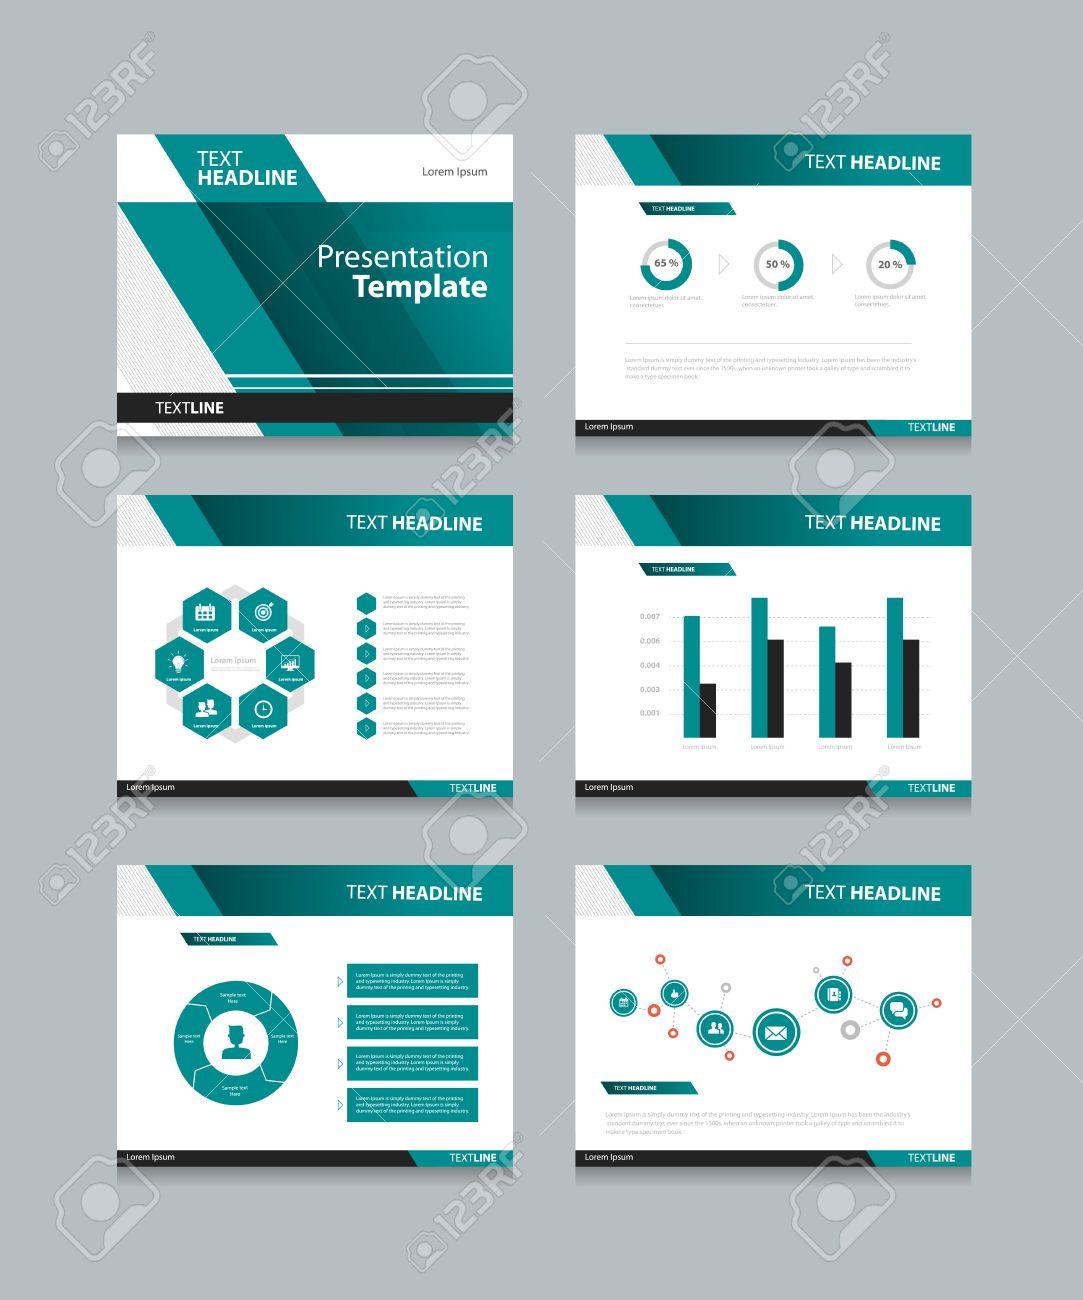 themes for presentation slides